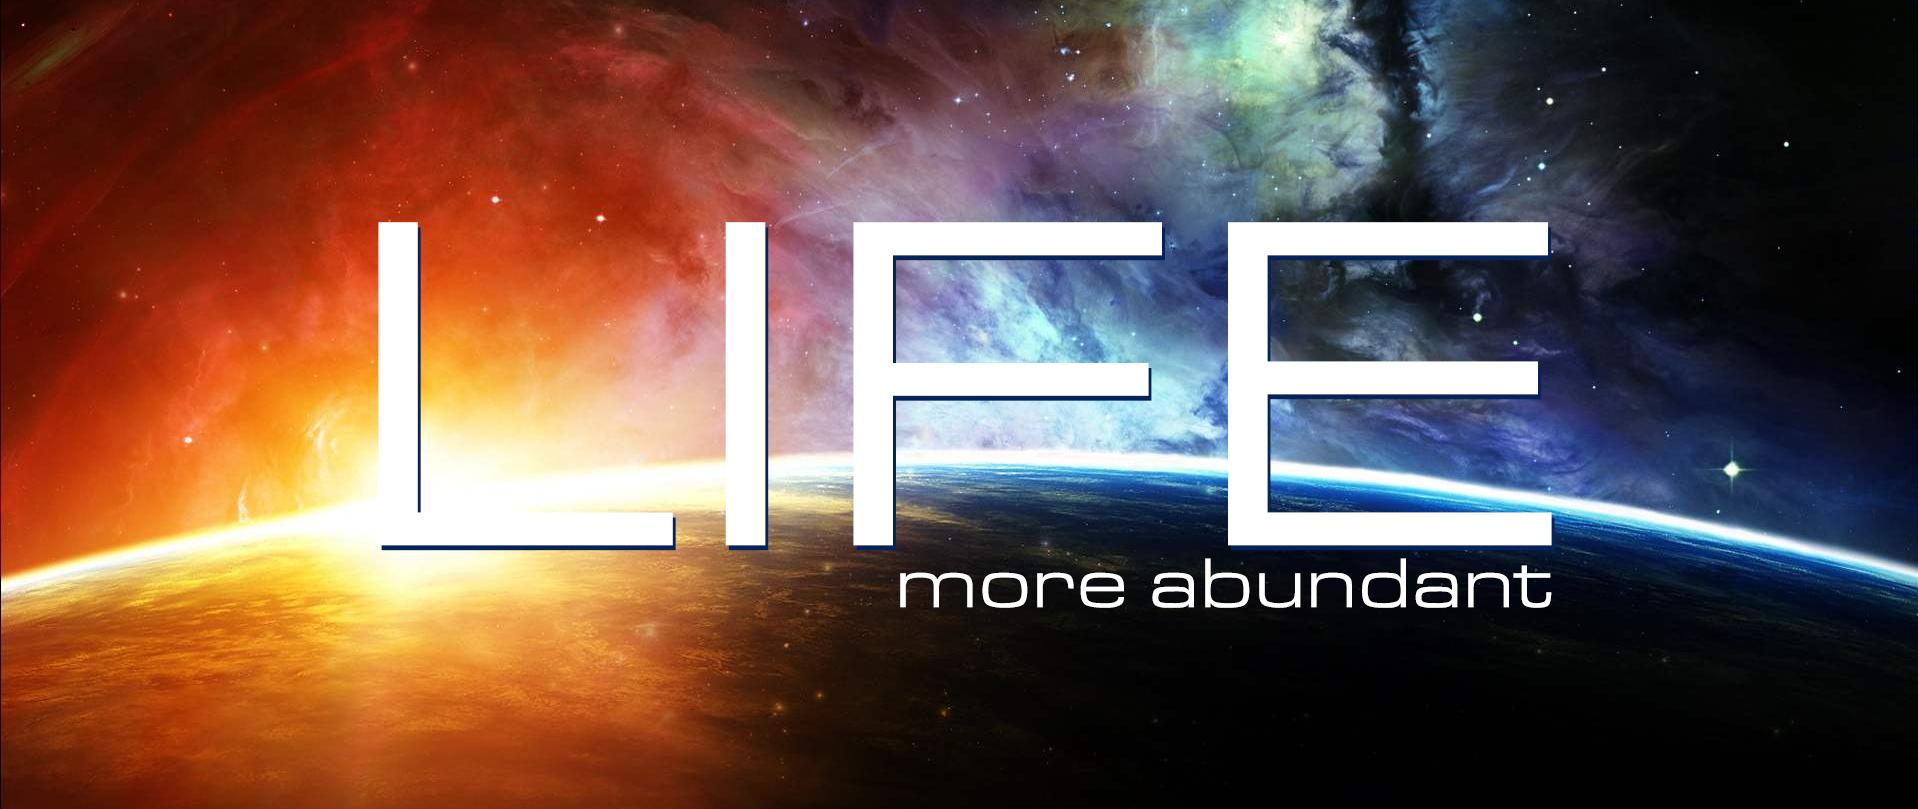 life-abundant